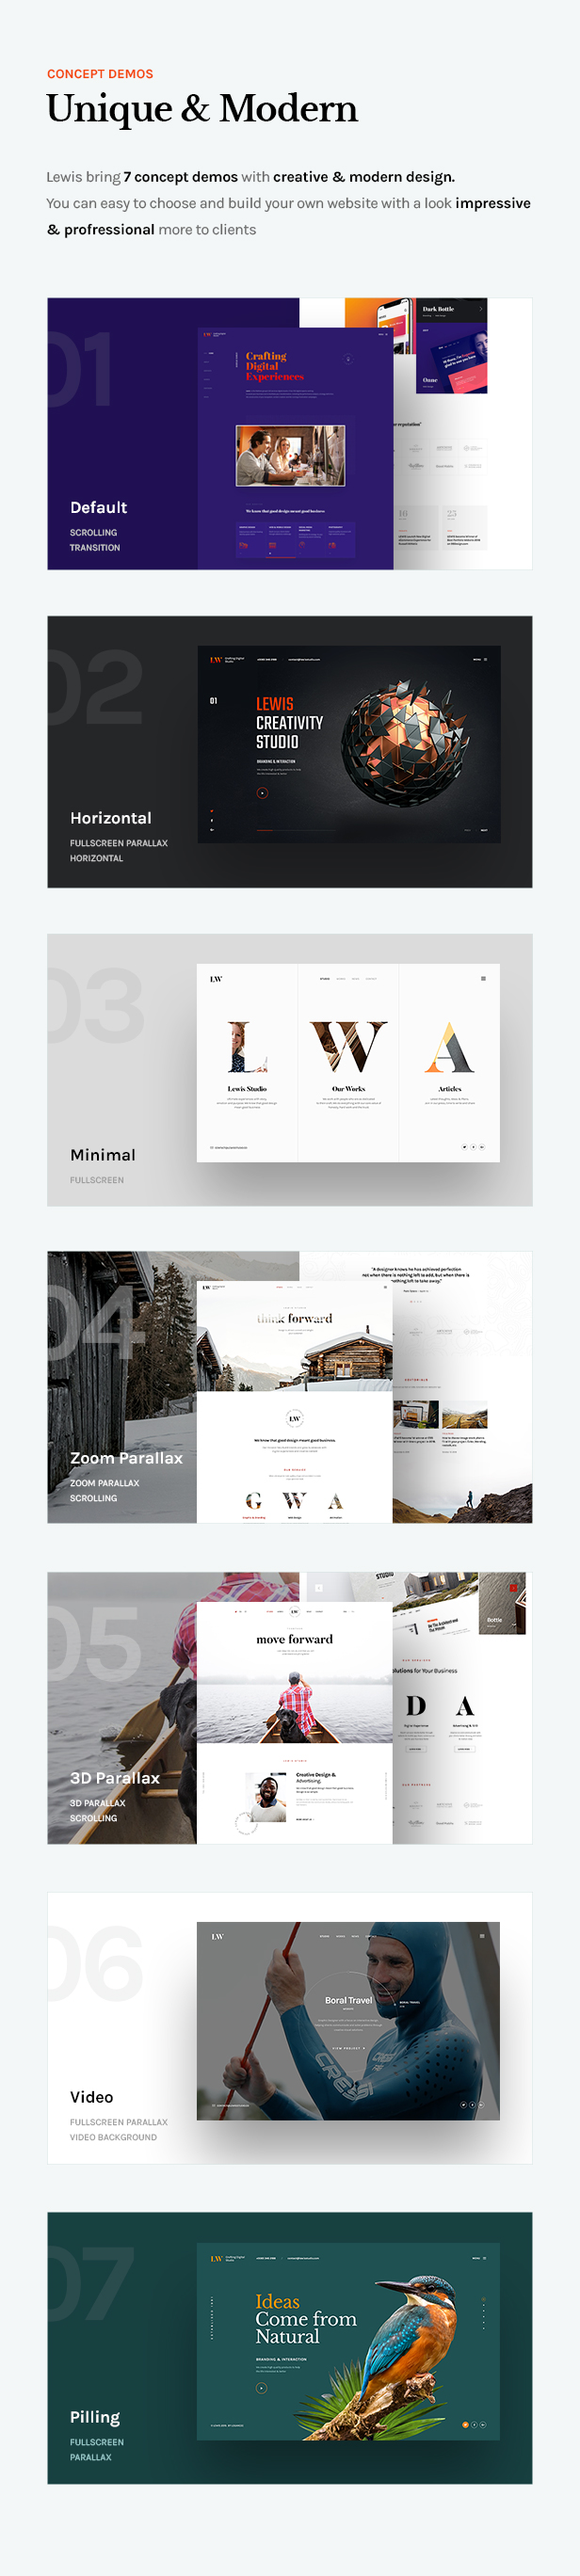 Lewis - Creative Portfolio & Agency HTML Template - 4